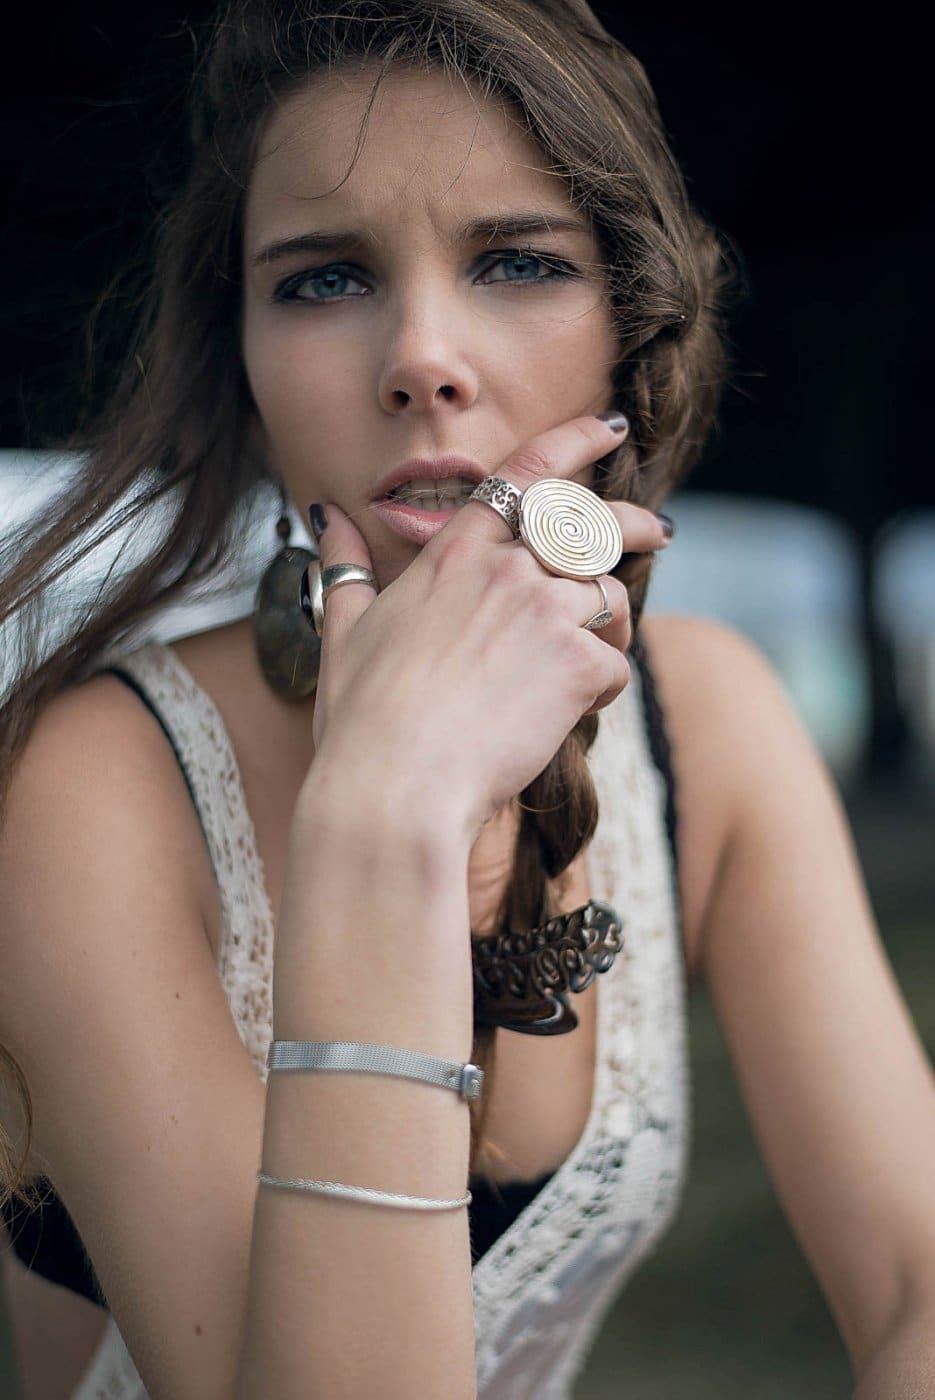 Portrait Photography By Anastasia Vervueren Fashions Emotions